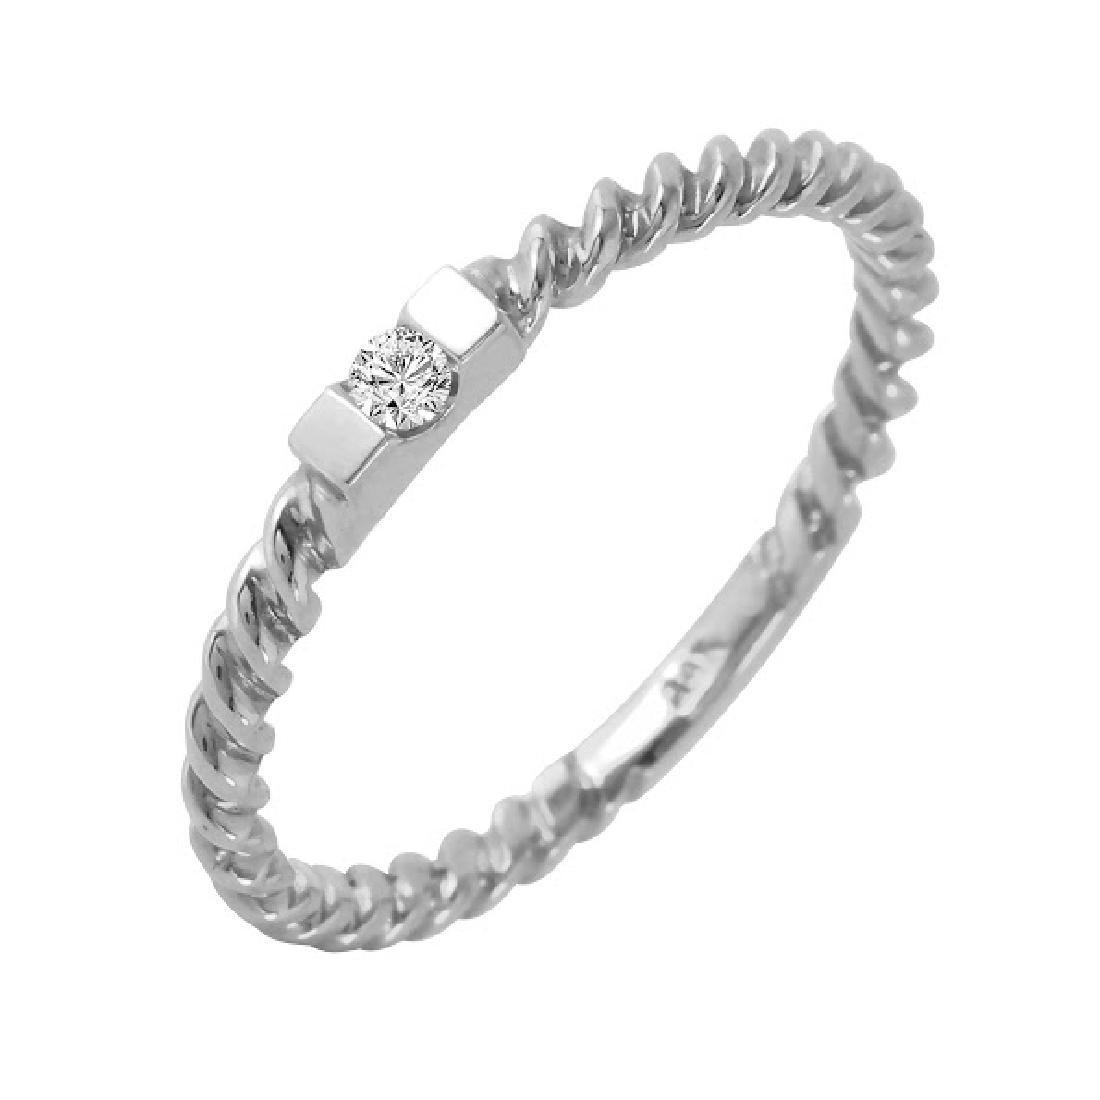 0.04 Carat Natural Diamond 18K Solid Rose Gold Ring